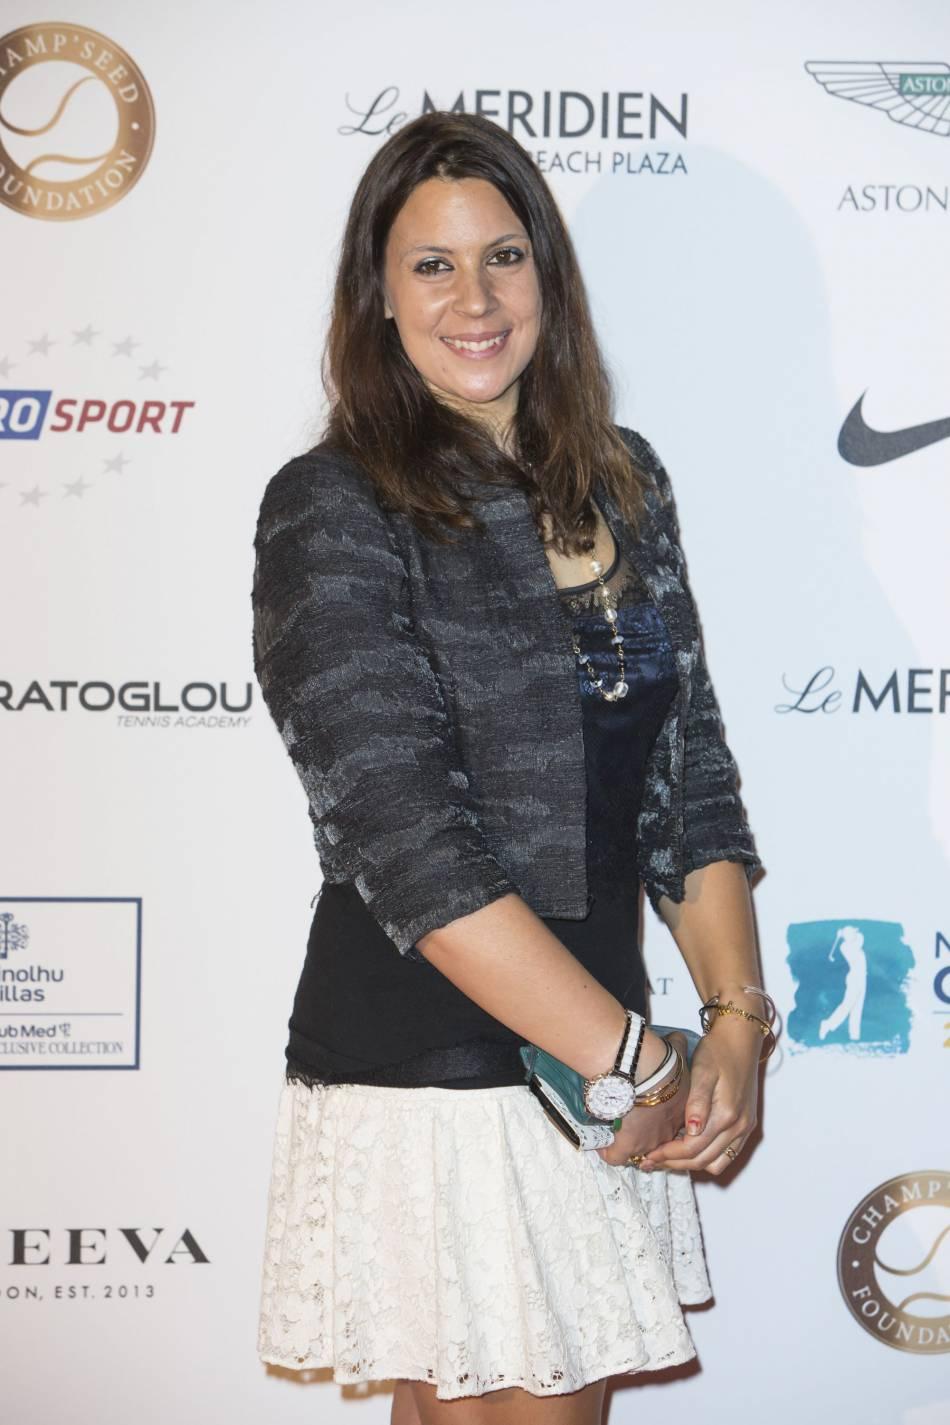 Marion Bartoli multiplie les collaborations.